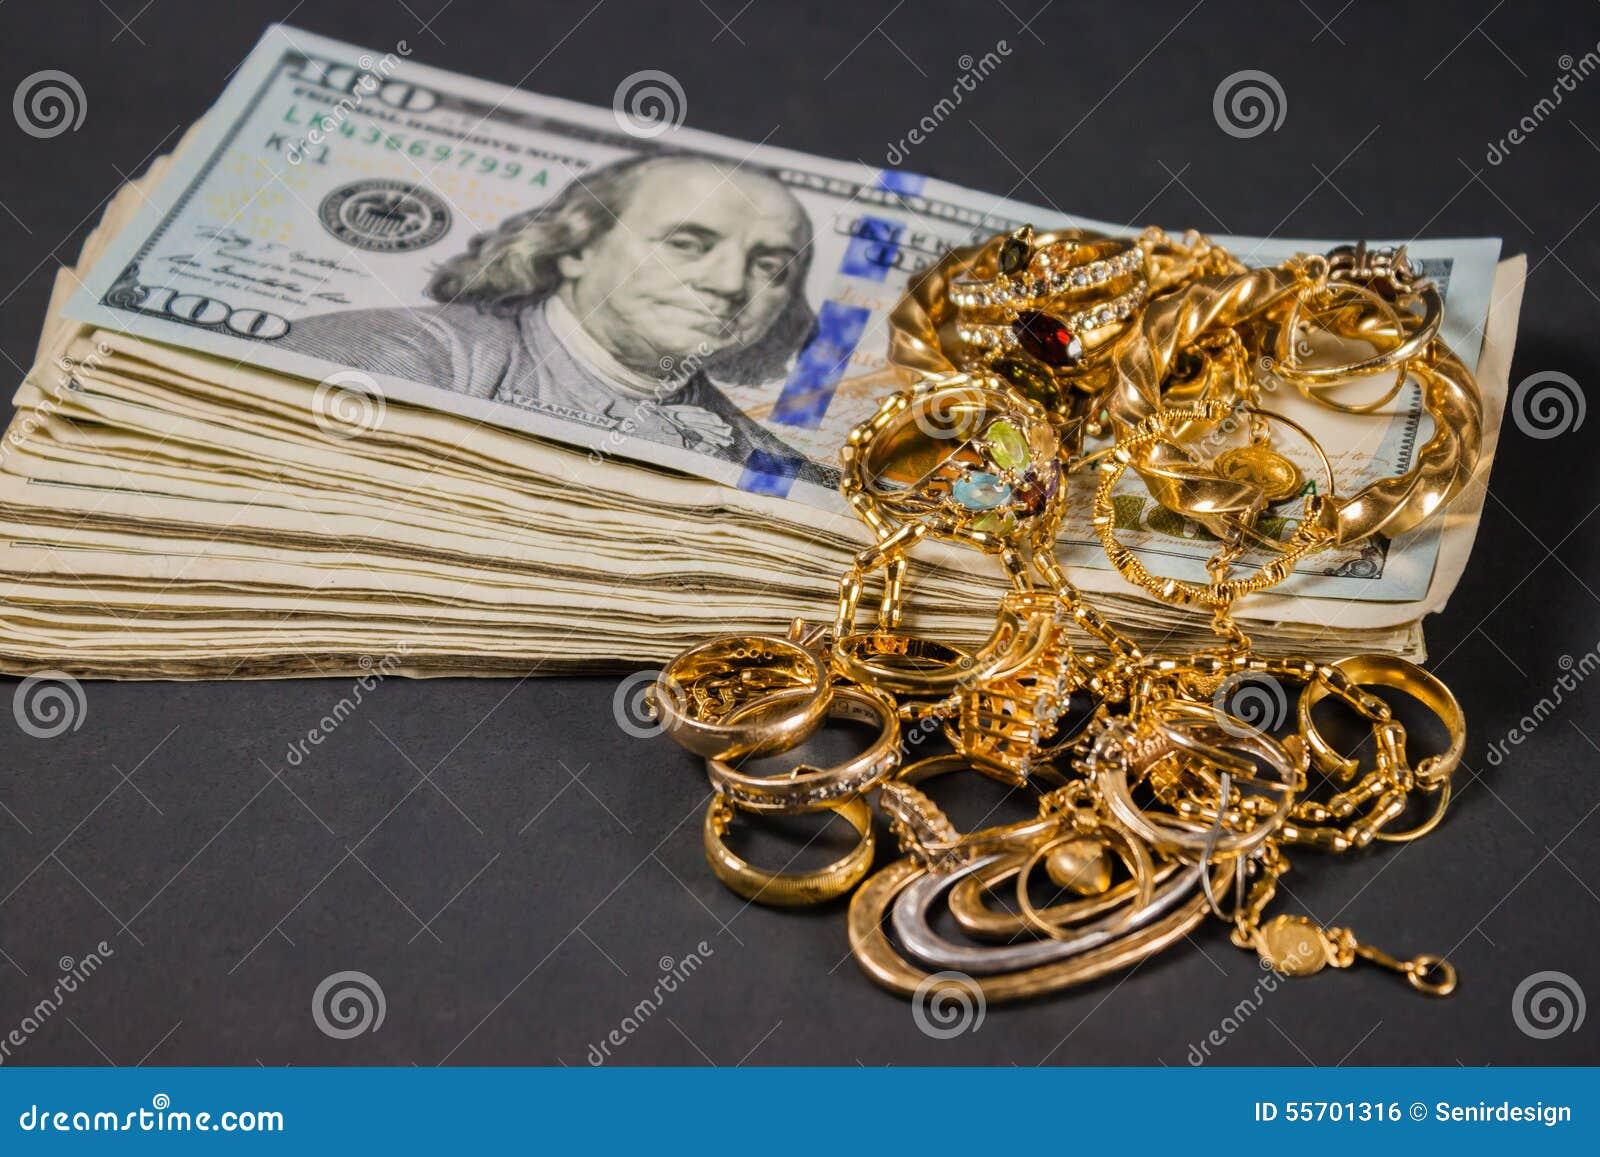 Получите наличными на золото 005